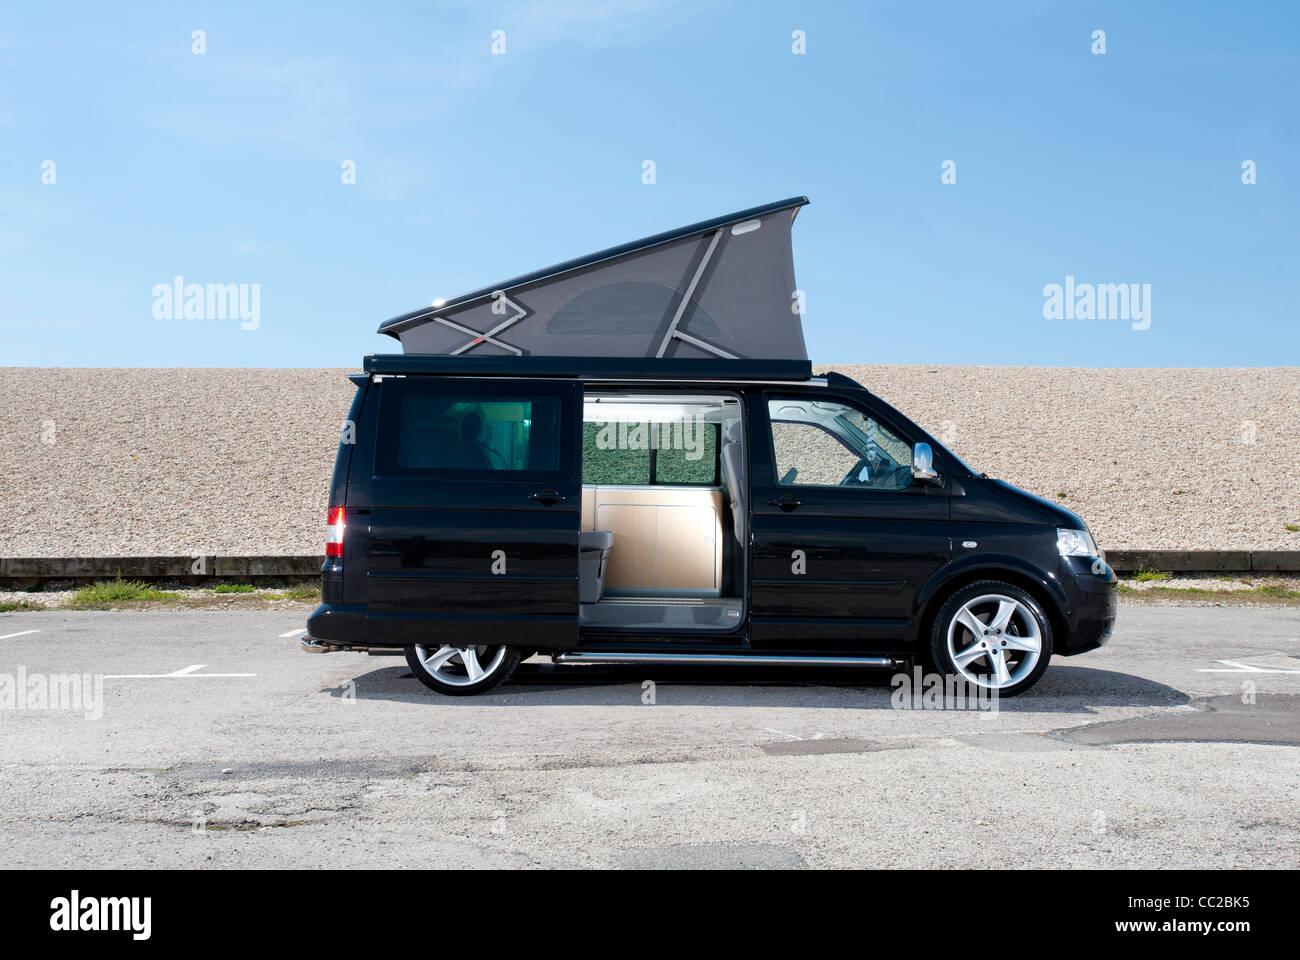 vw t5 camper van stock photos vw t5 camper van stock. Black Bedroom Furniture Sets. Home Design Ideas